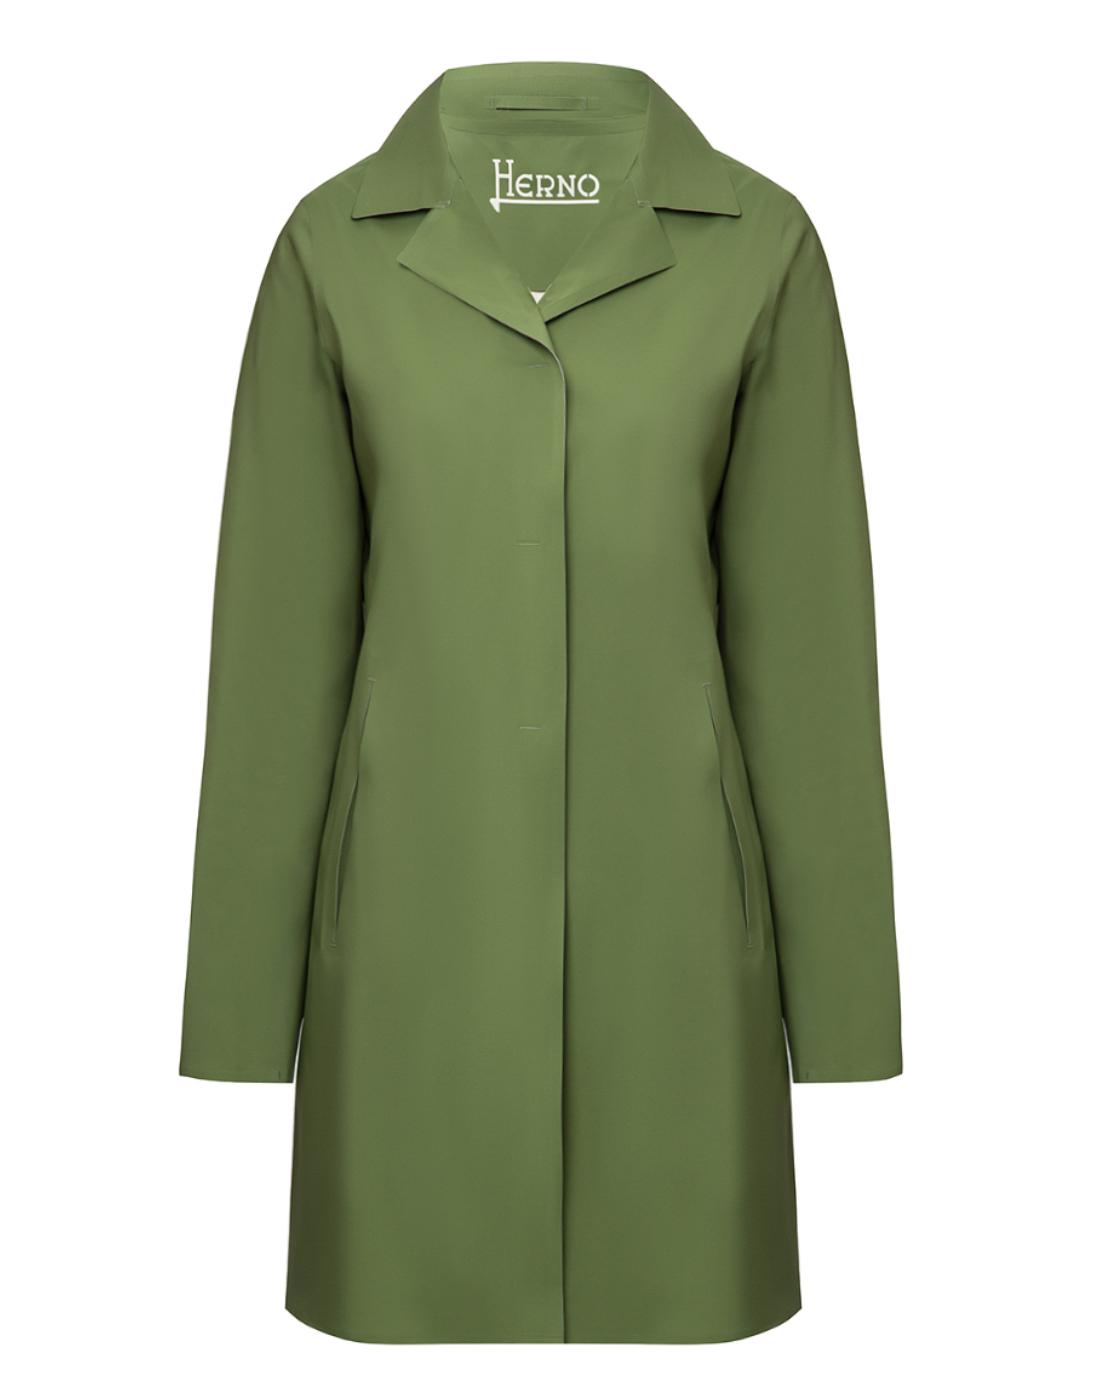 Женский зеленый плащ Herno SIM0035D-19289-7012-1